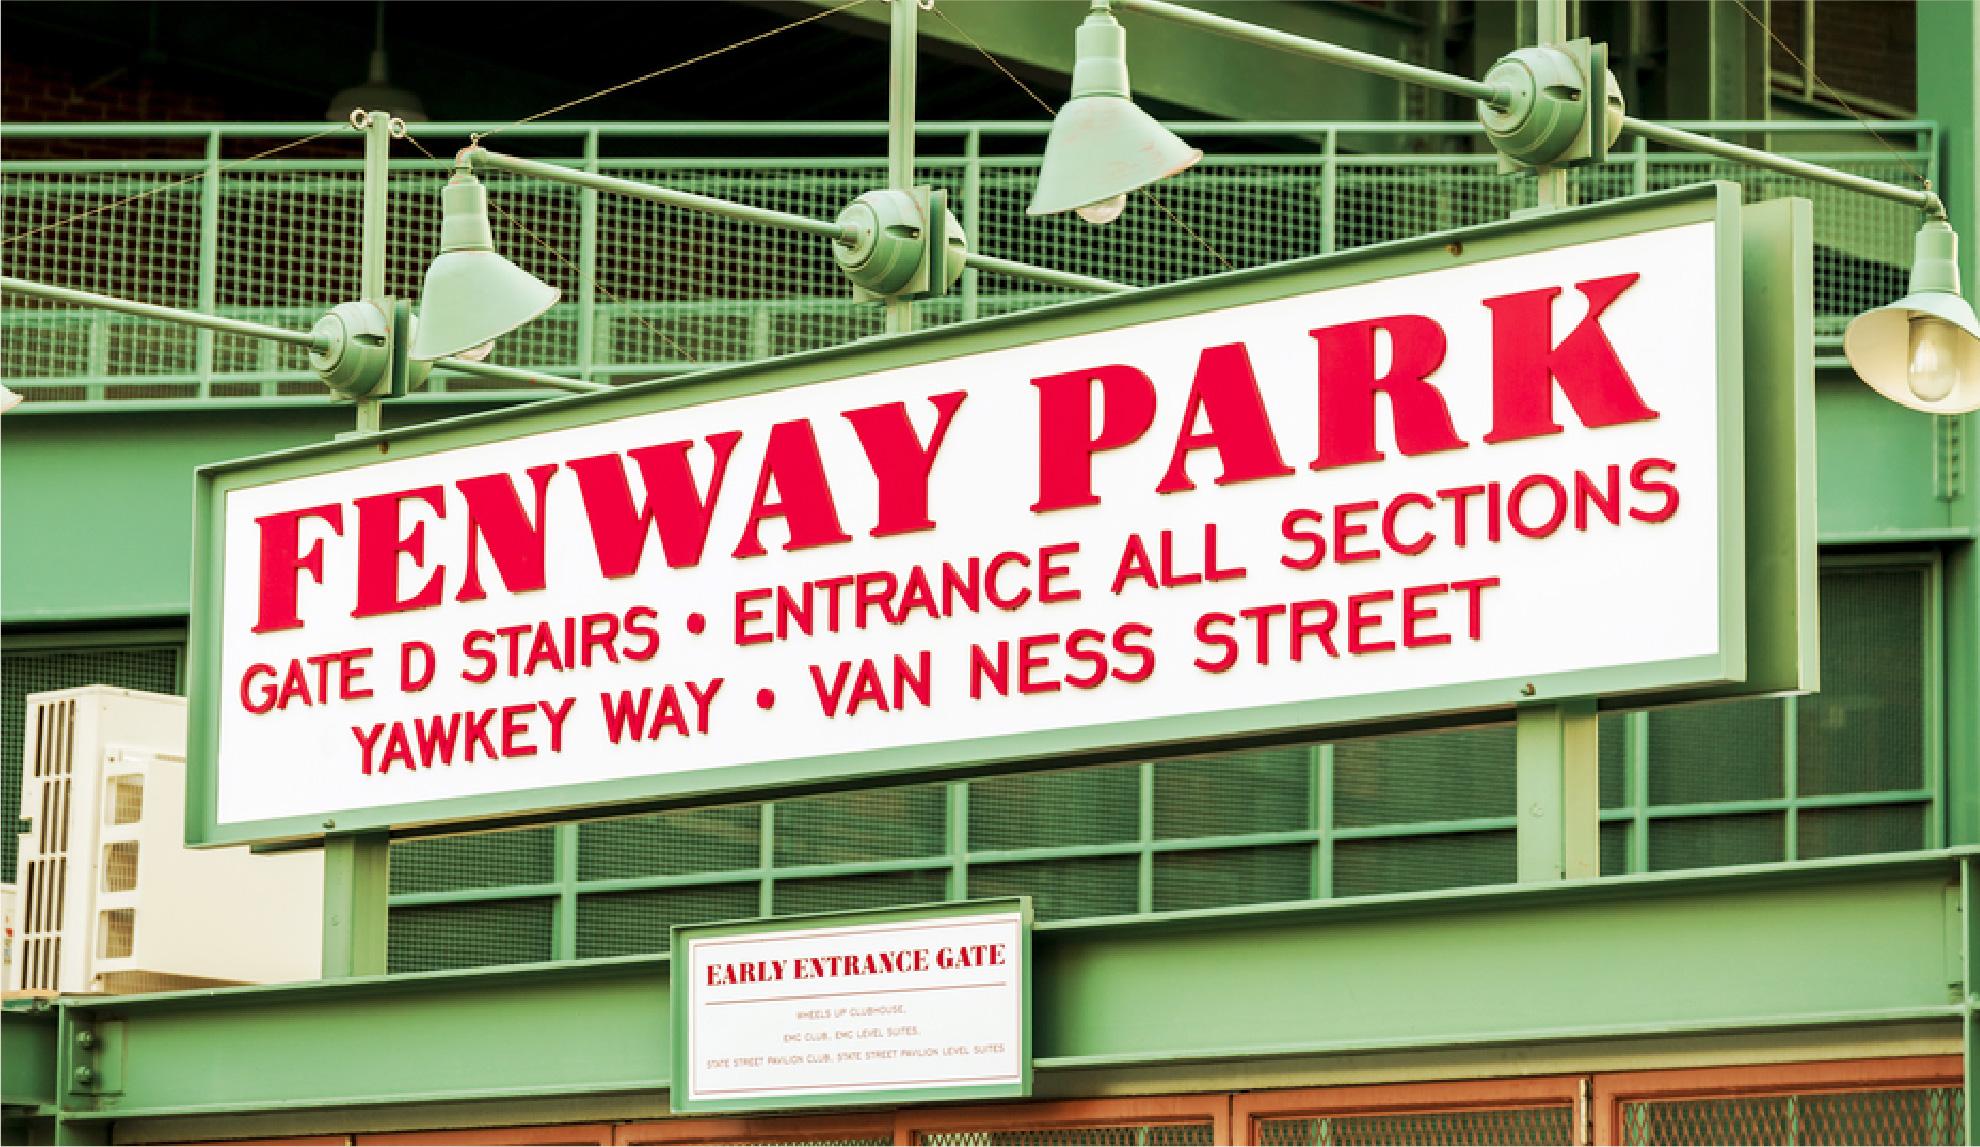 fenway-park-sign